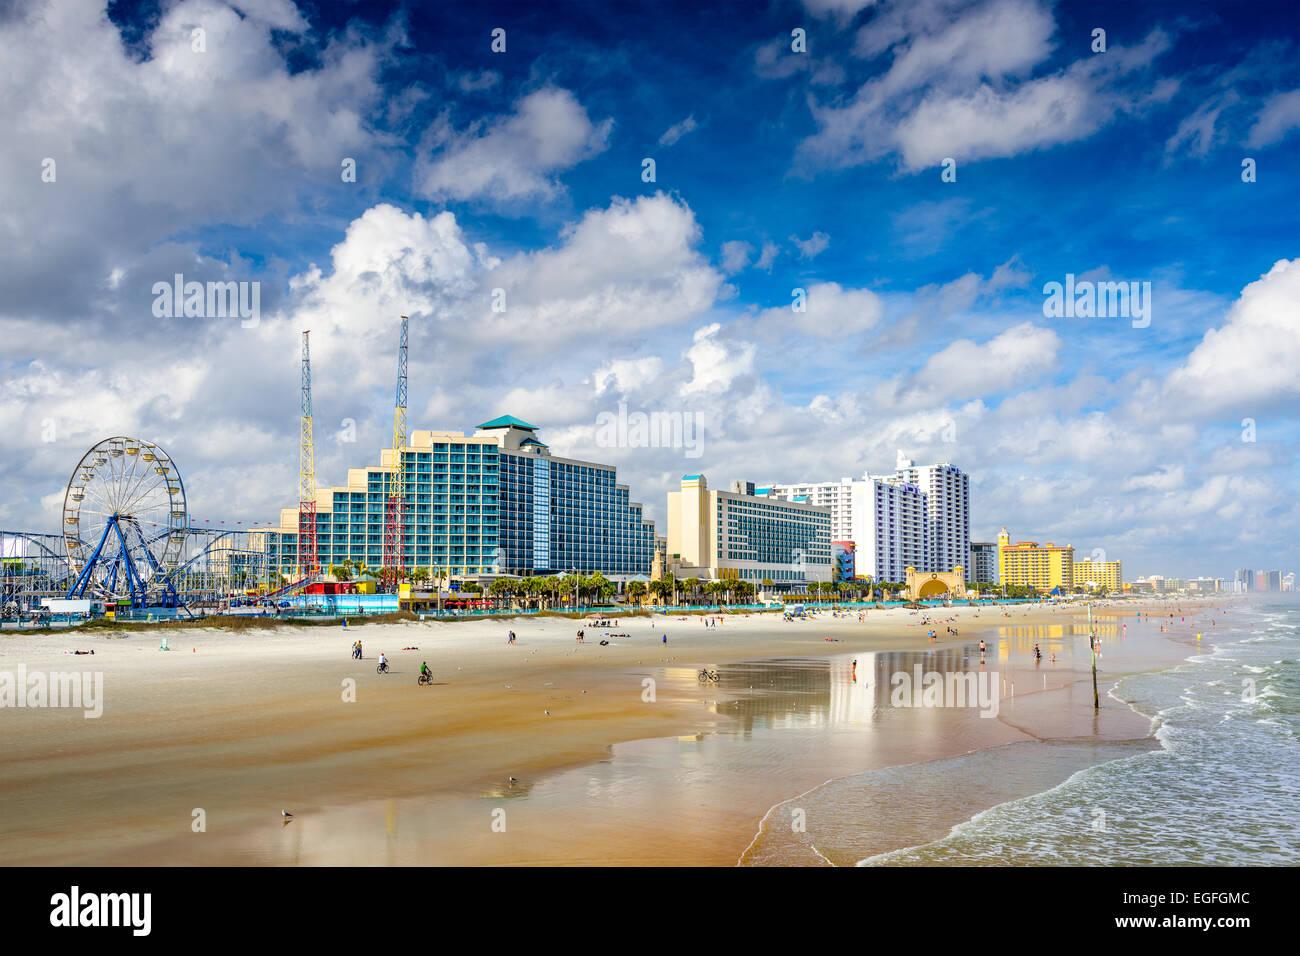 Daytona Beach, Florida, USA beachfront skyline. - Stock Image